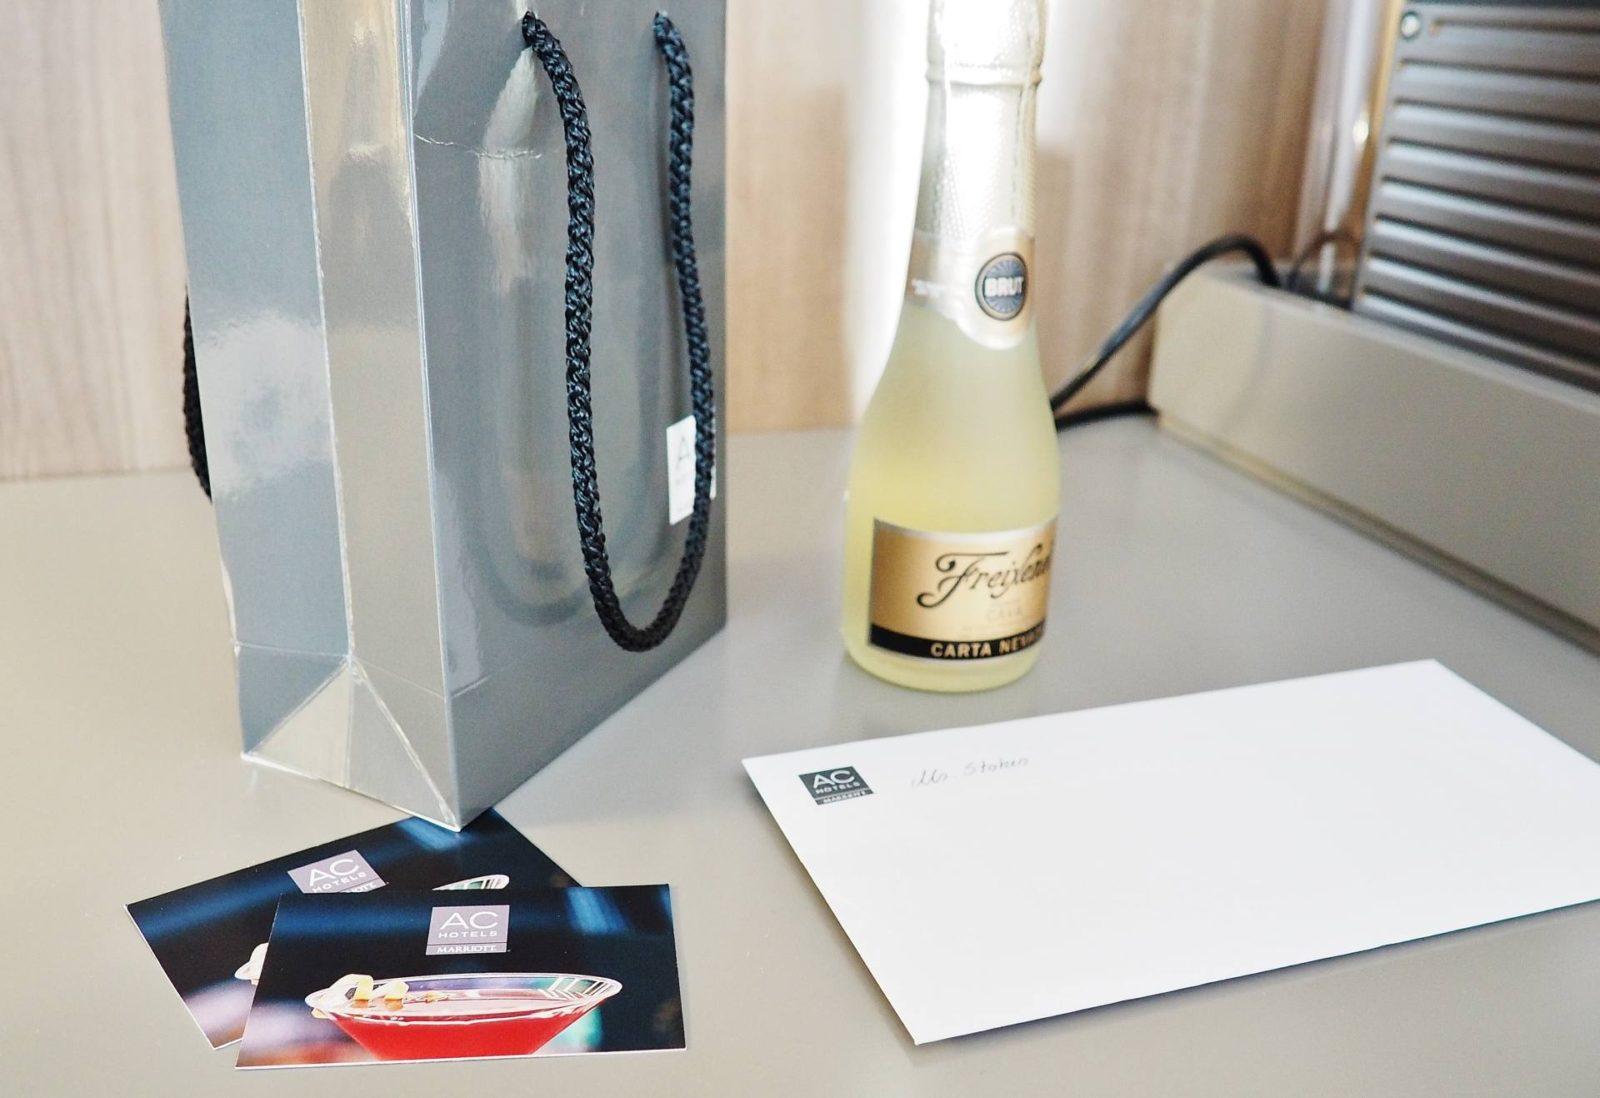 Emma Victoria Stokes AC Hotel Birmingham Marriott Blogger Gifts